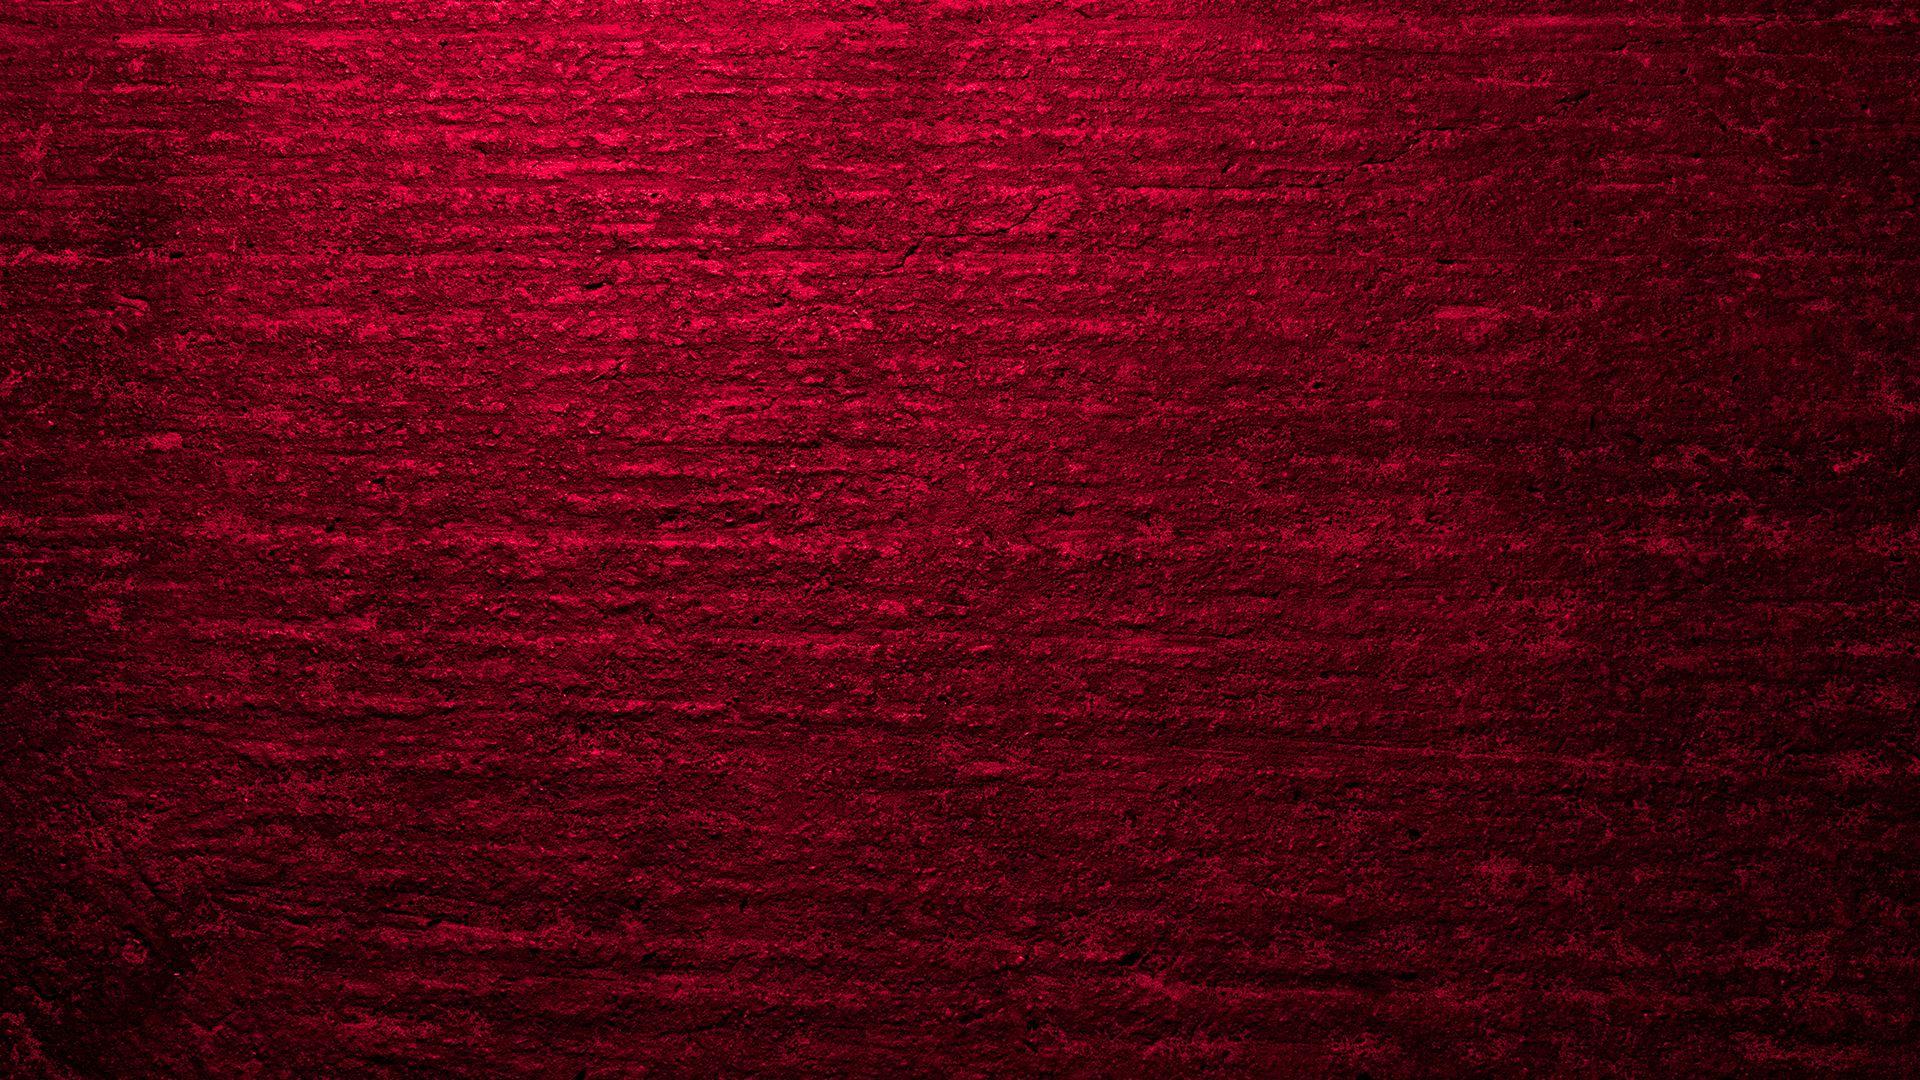 Burgundy download wallpaper image